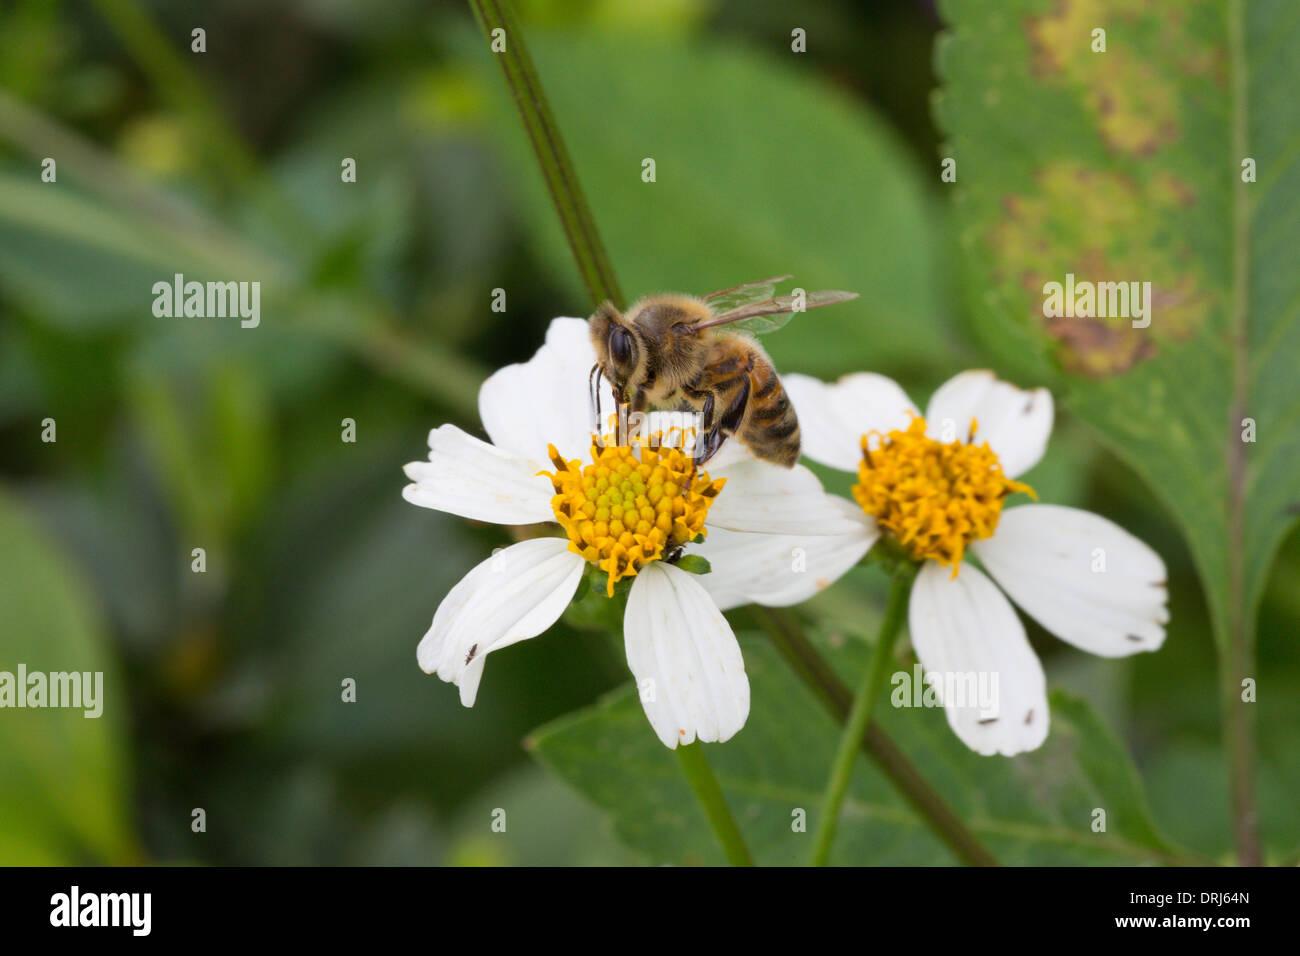 Closeup of honeybee pollinating white flower - Stock Image